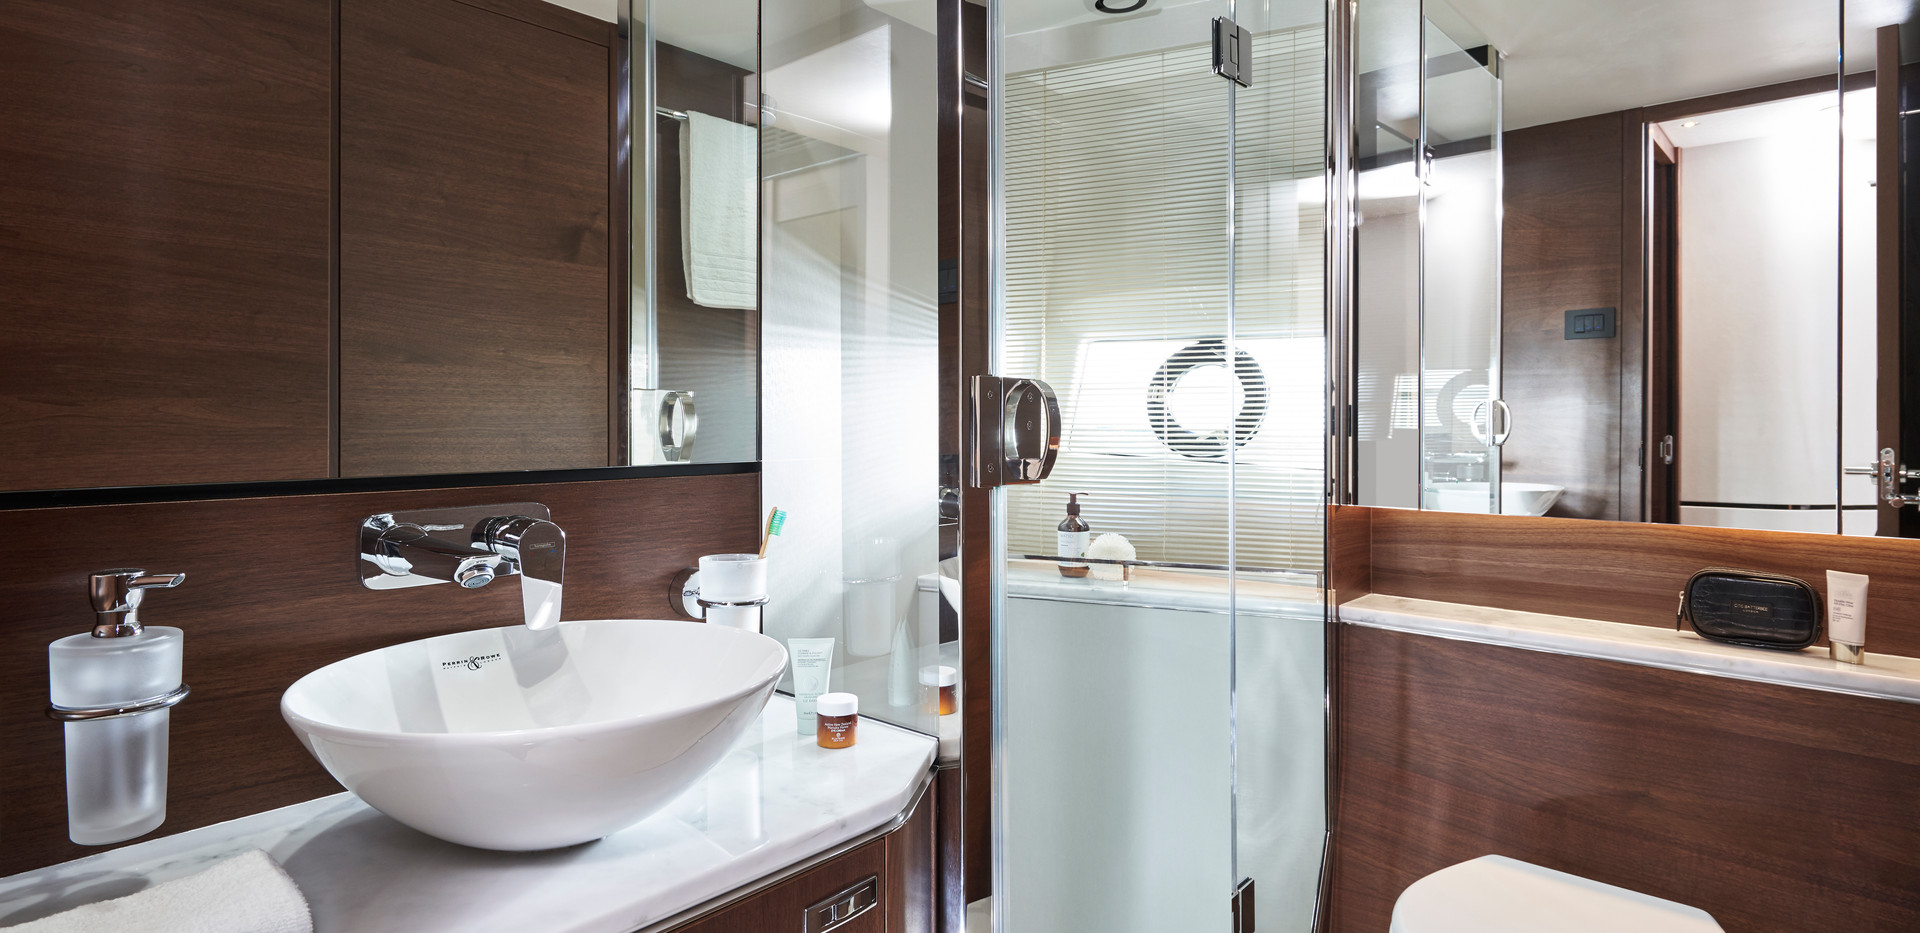 s66-interior-starboard-bathroom-walnut-s